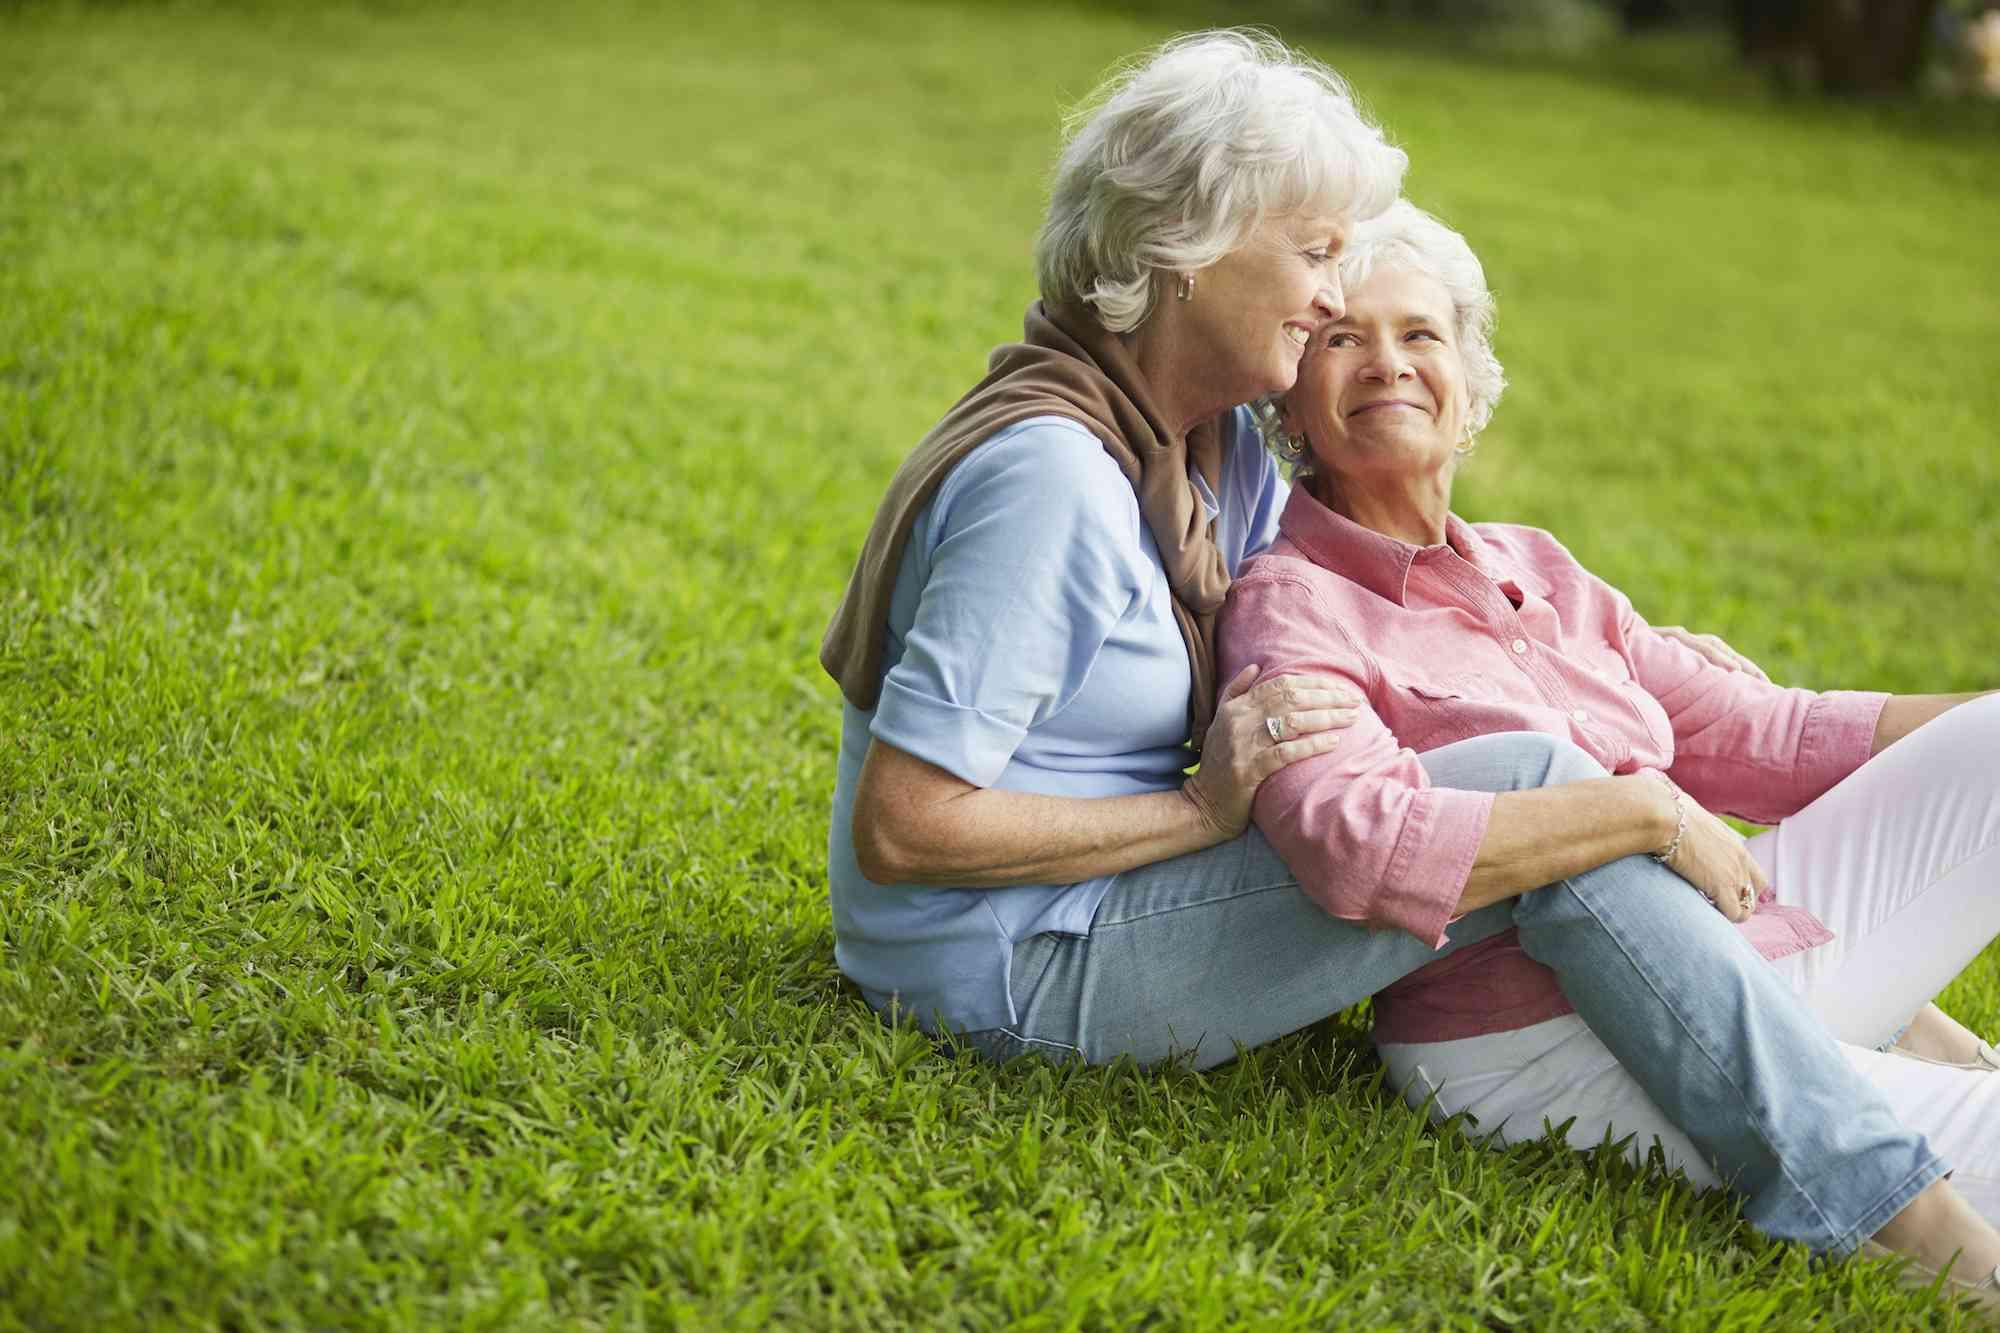 Elderly same-sex female couple sharing time